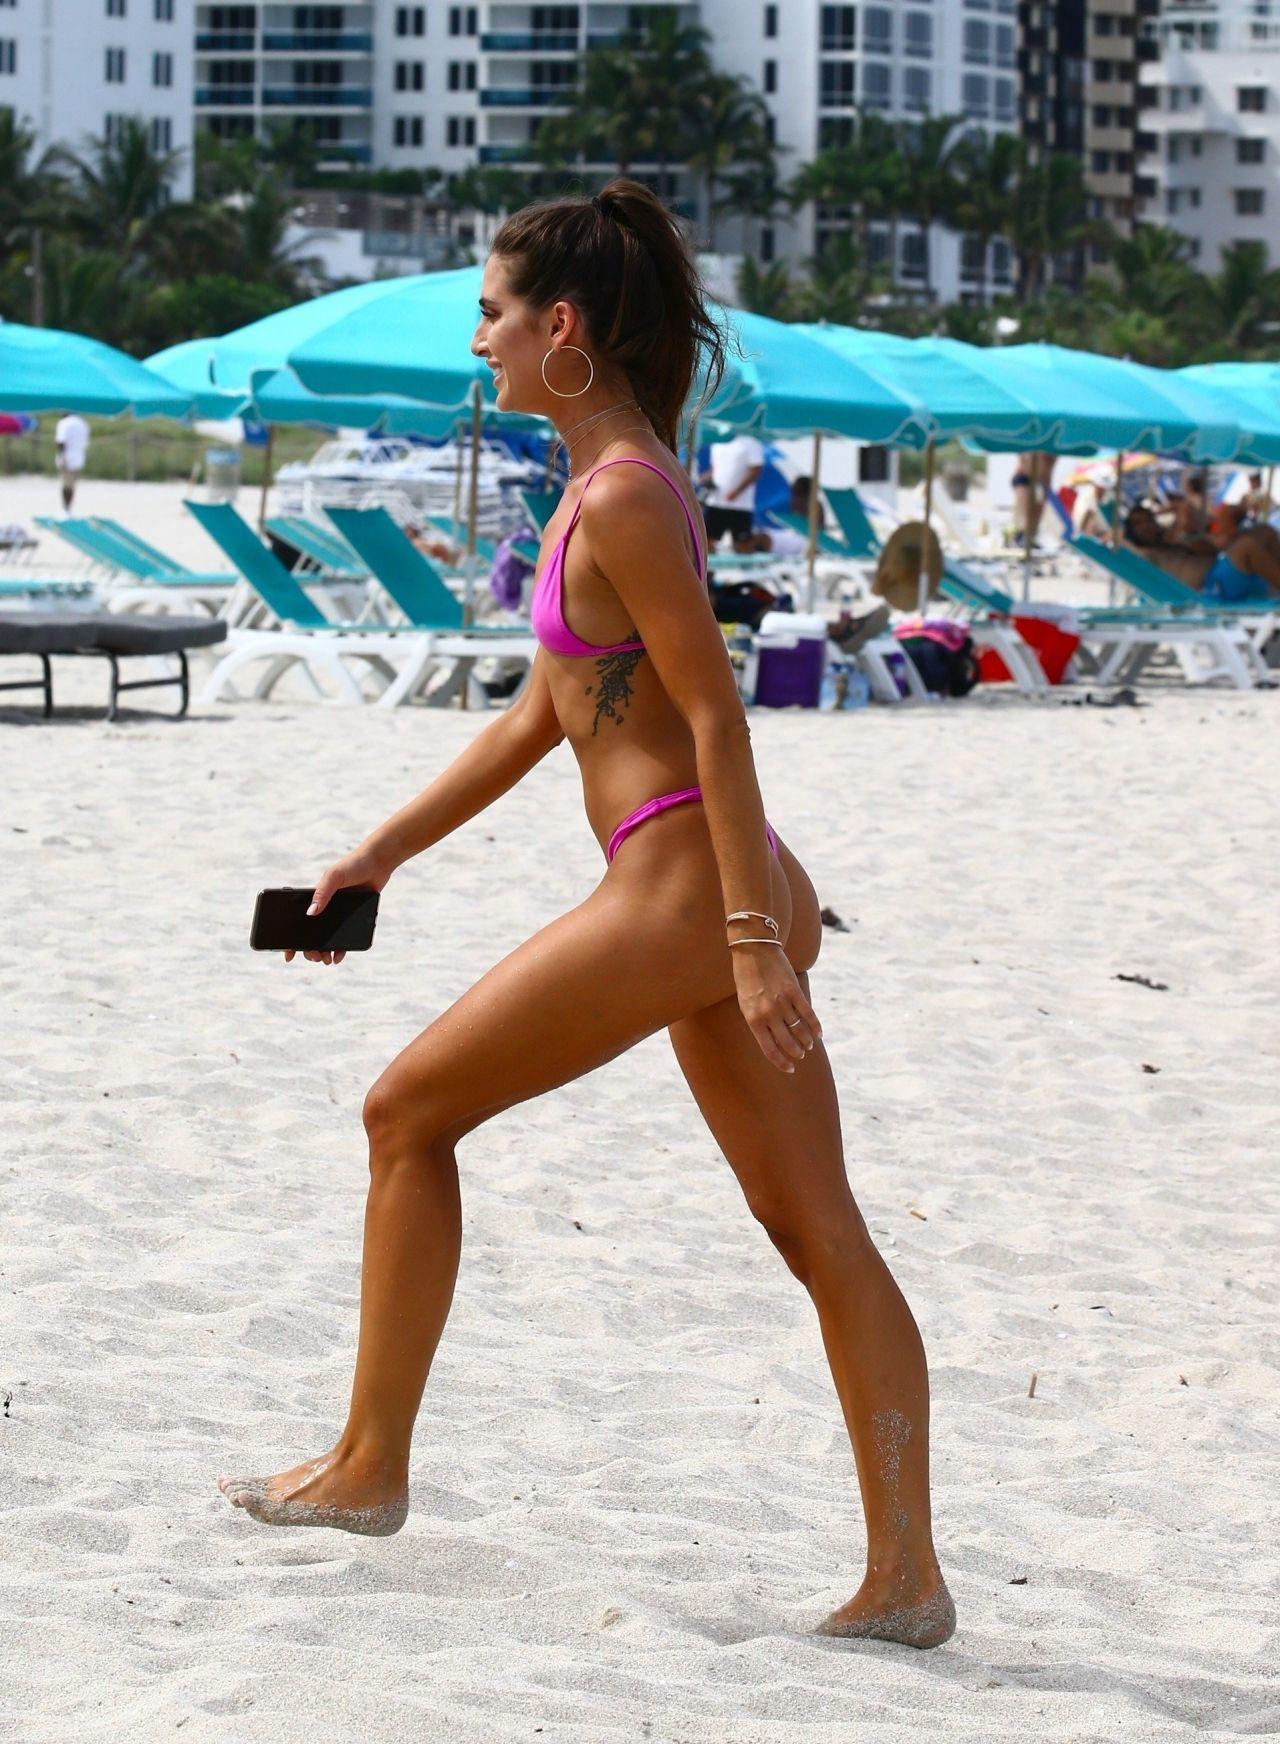 Leaked Elizabeth Ruiz nudes (22 photo), Pussy, Paparazzi, Twitter, in bikini 2019